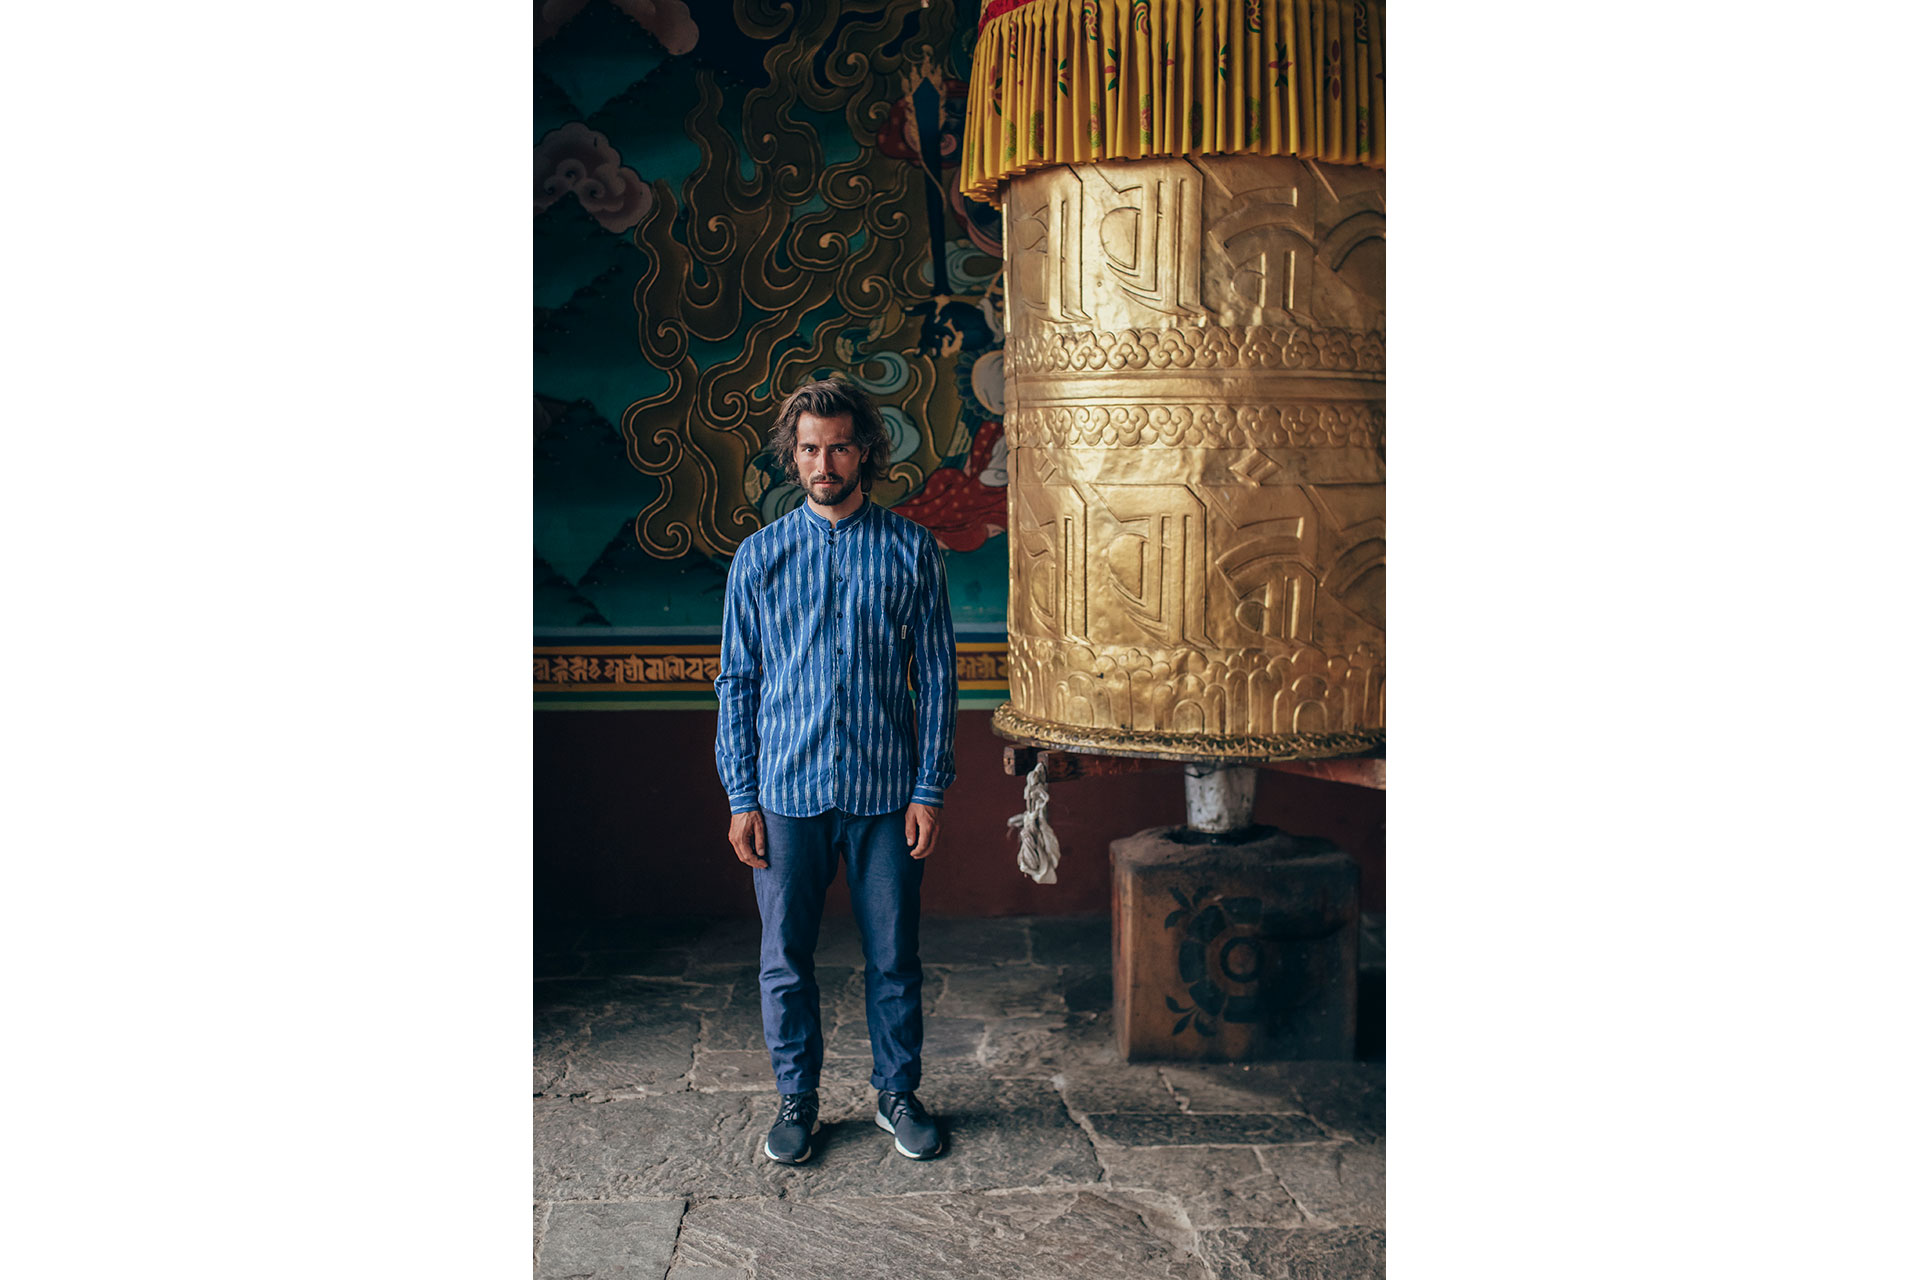 Reise Fotograf Streetwear People Bhutan Himalaya Maloja Gebetsmühlen